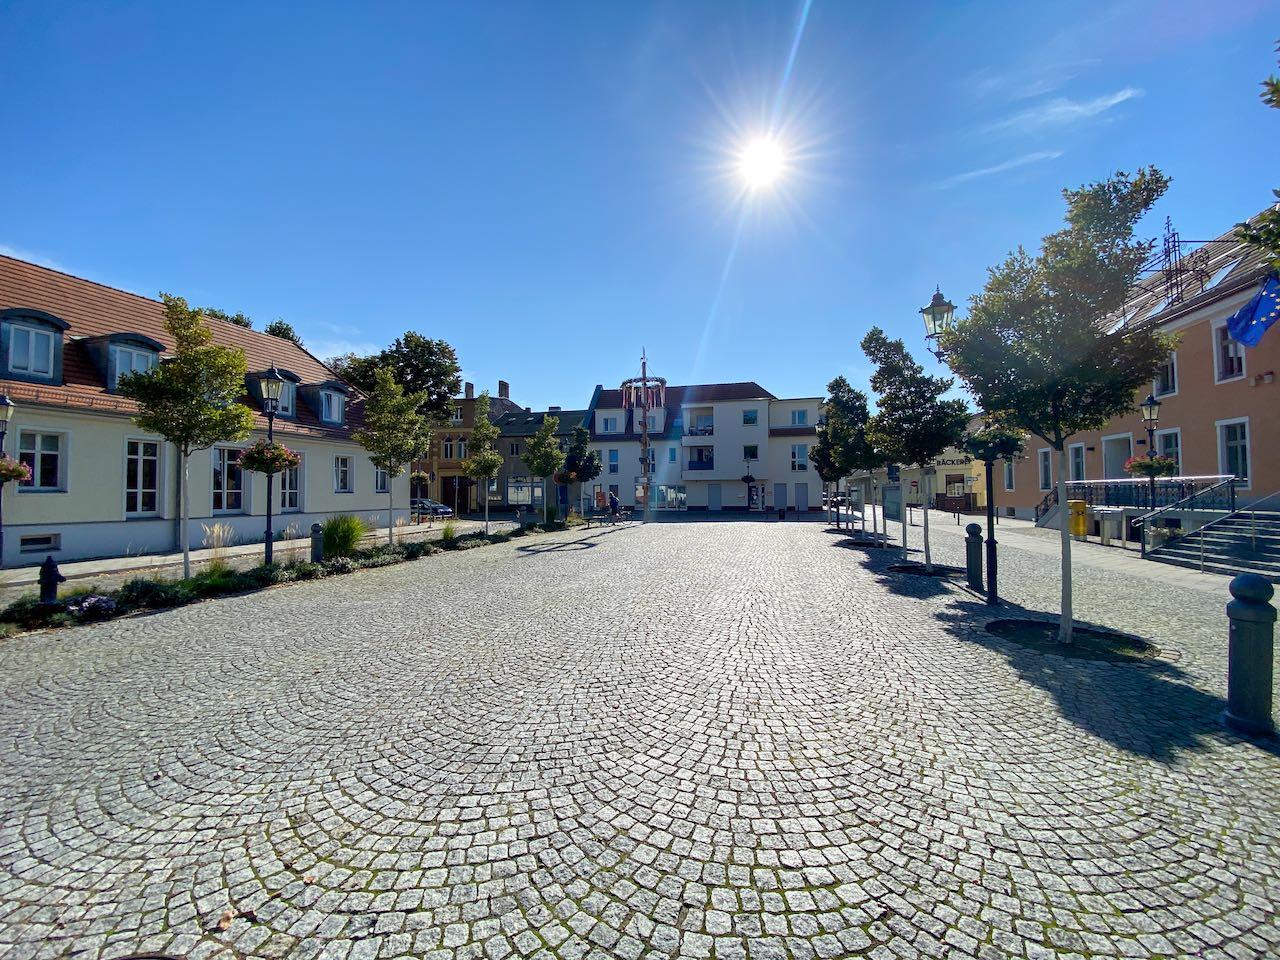 Marktplatz Teltow